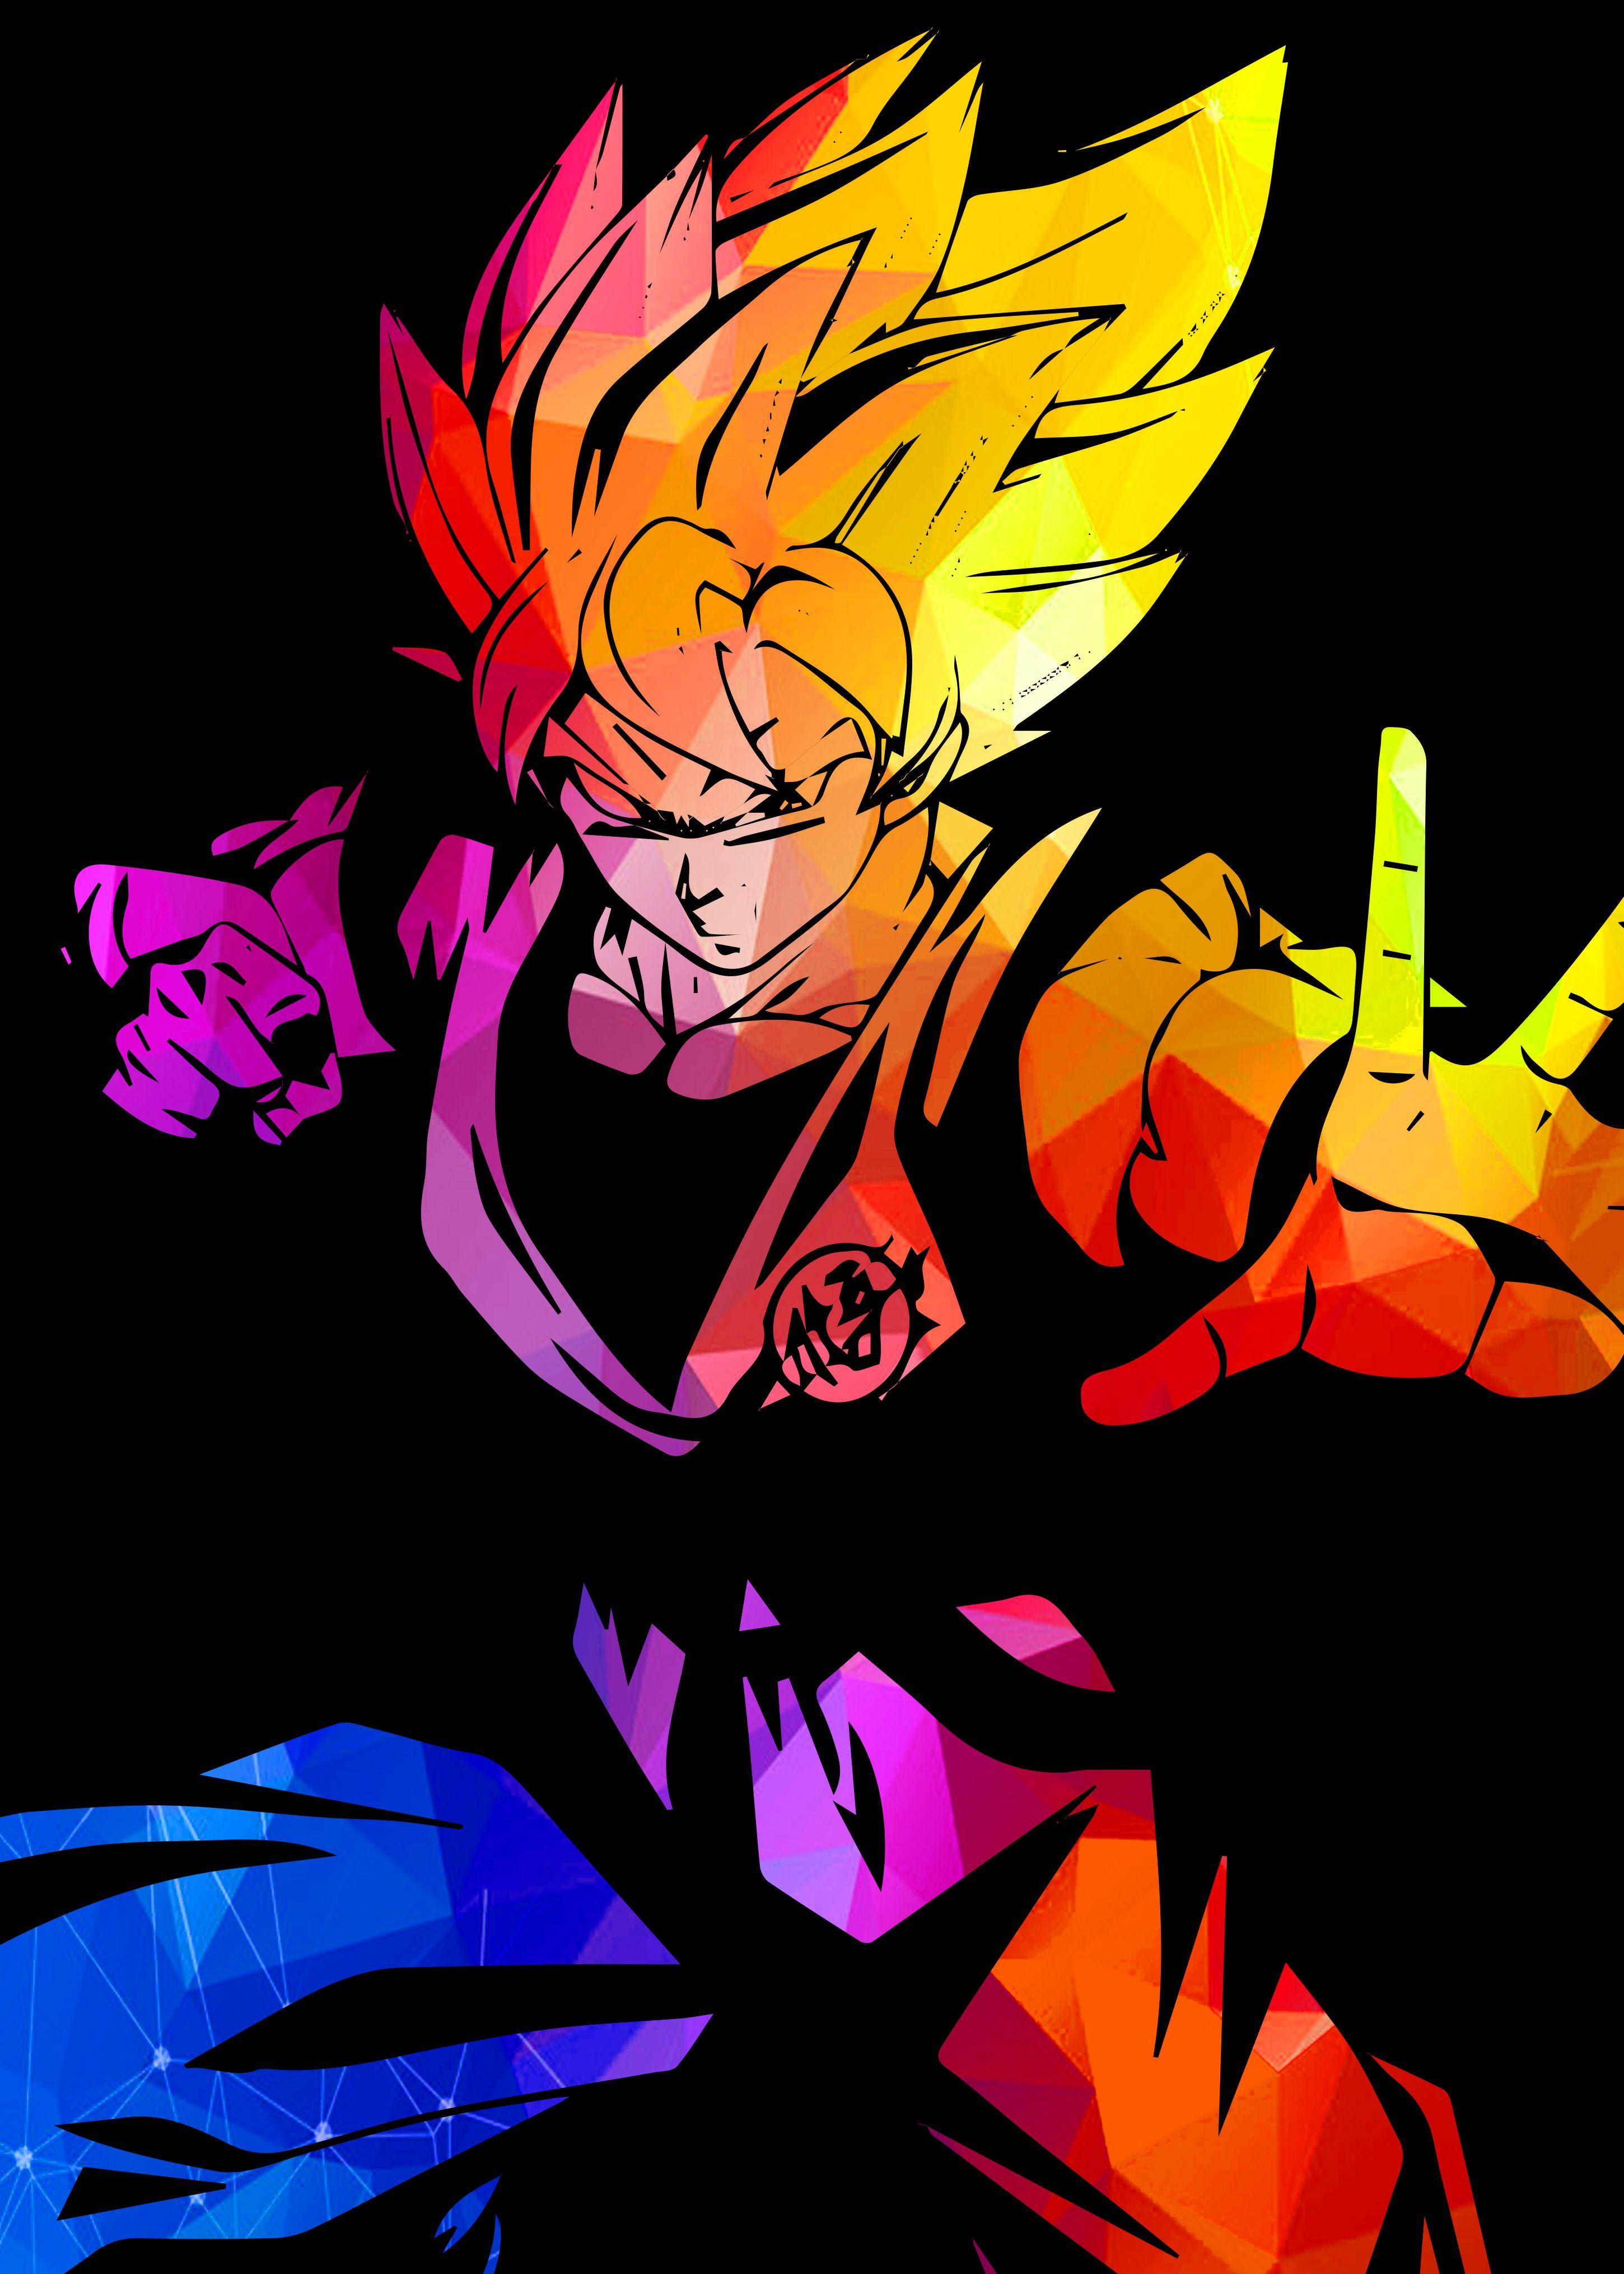 Goku Supersaiyan In 2020 Metal Posters Poster Making Metal Posters Design